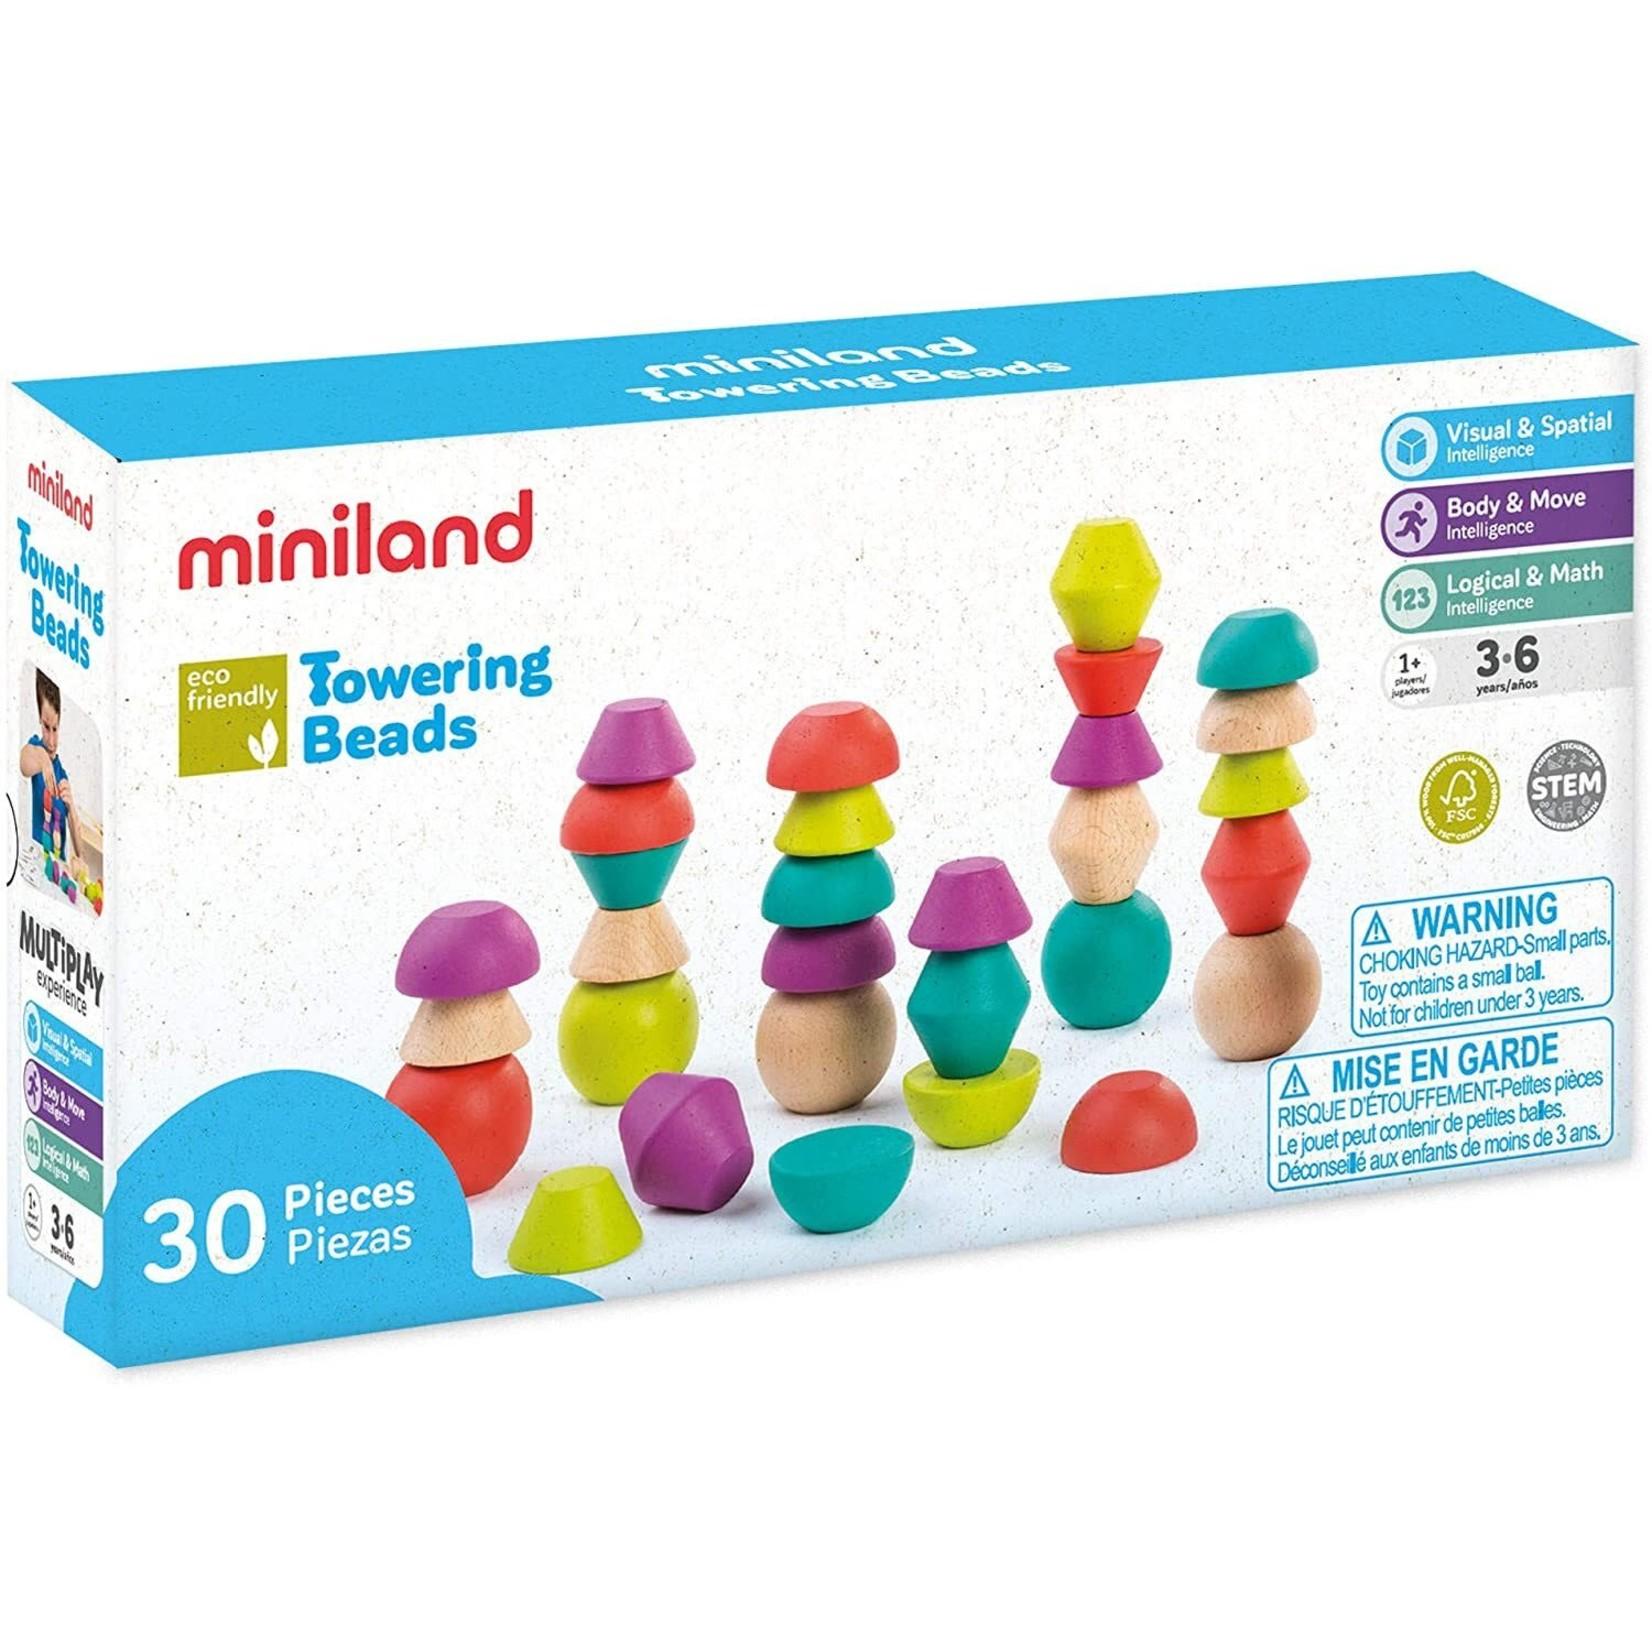 Miniland Miniland Eco Towering Beads